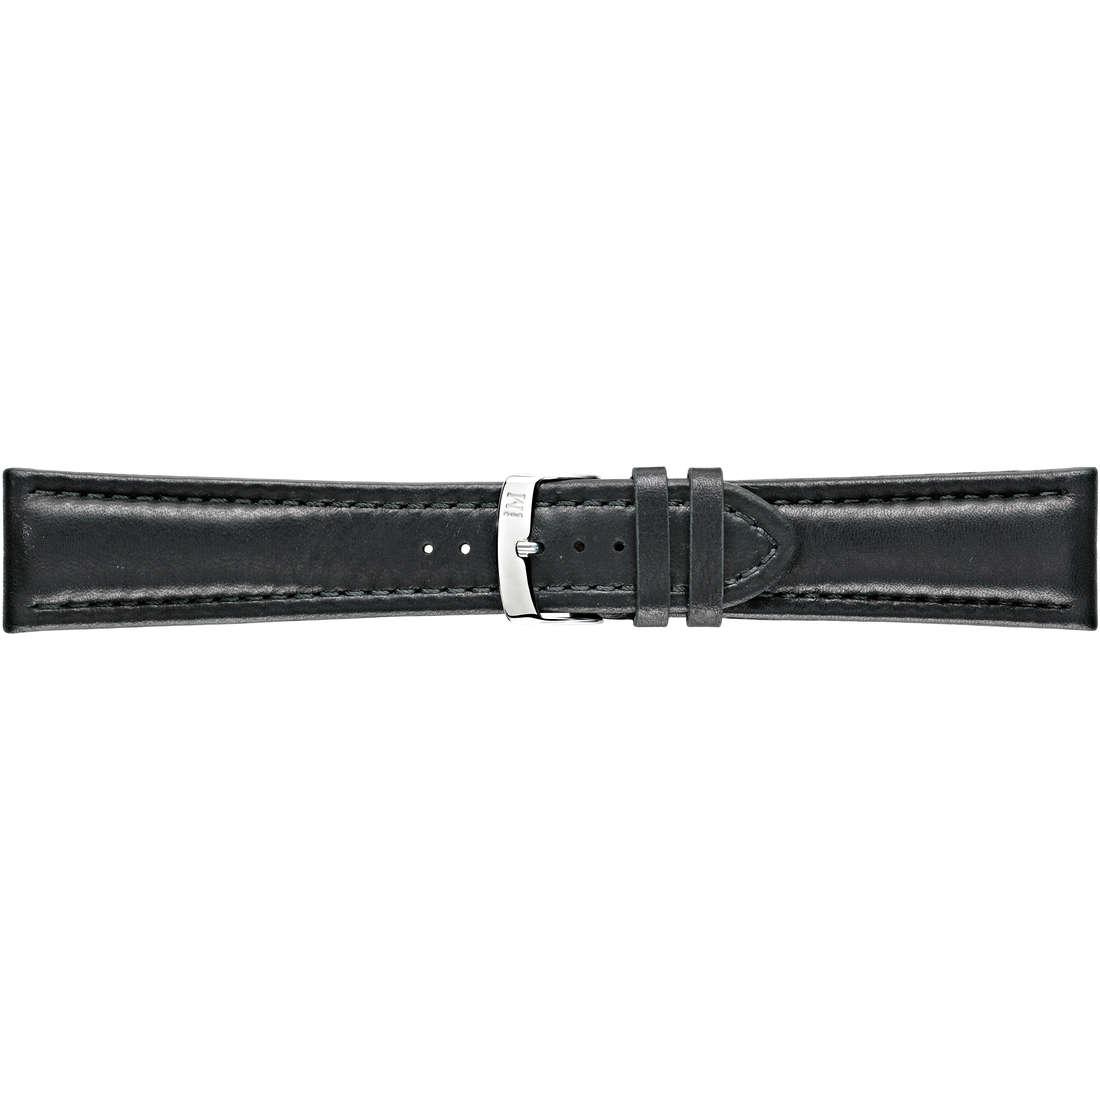 watch watch bands watch straps man Morellato Morellato 1930 A01U4026A37019CR22